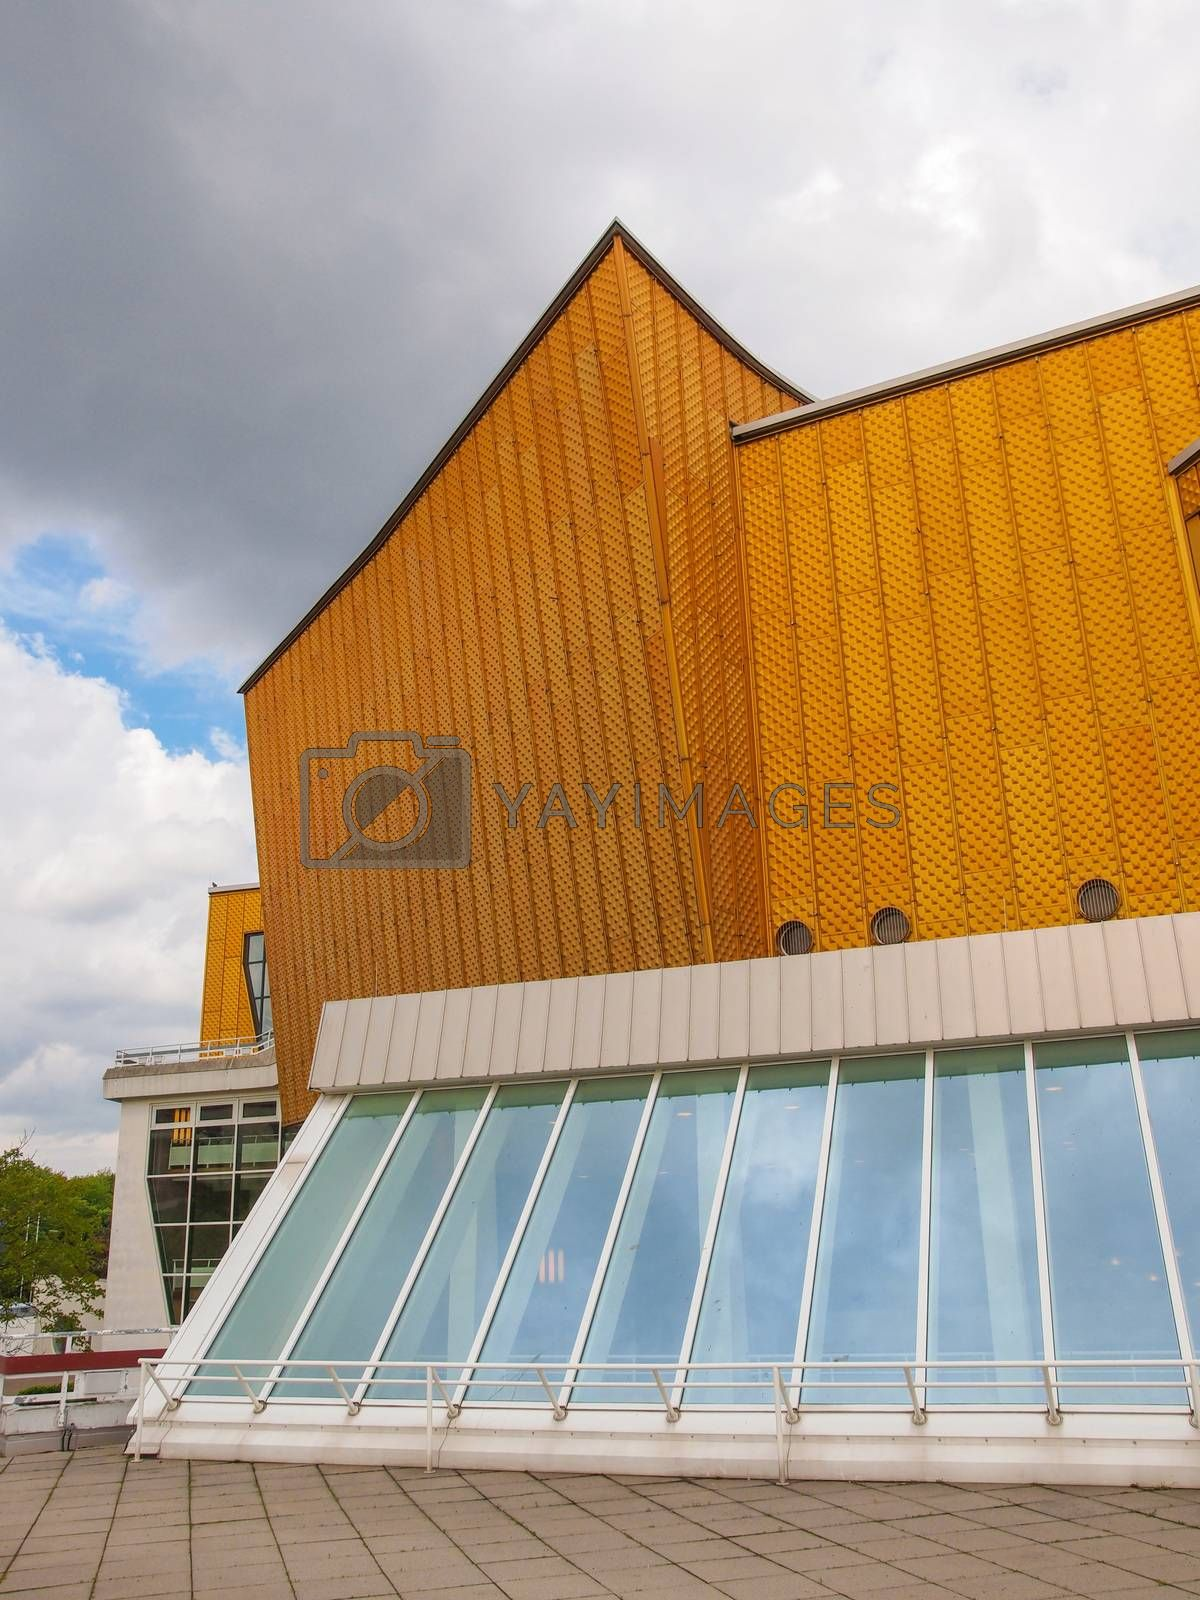 Royalty free image of Berliner Philharmonie by claudiodivizia